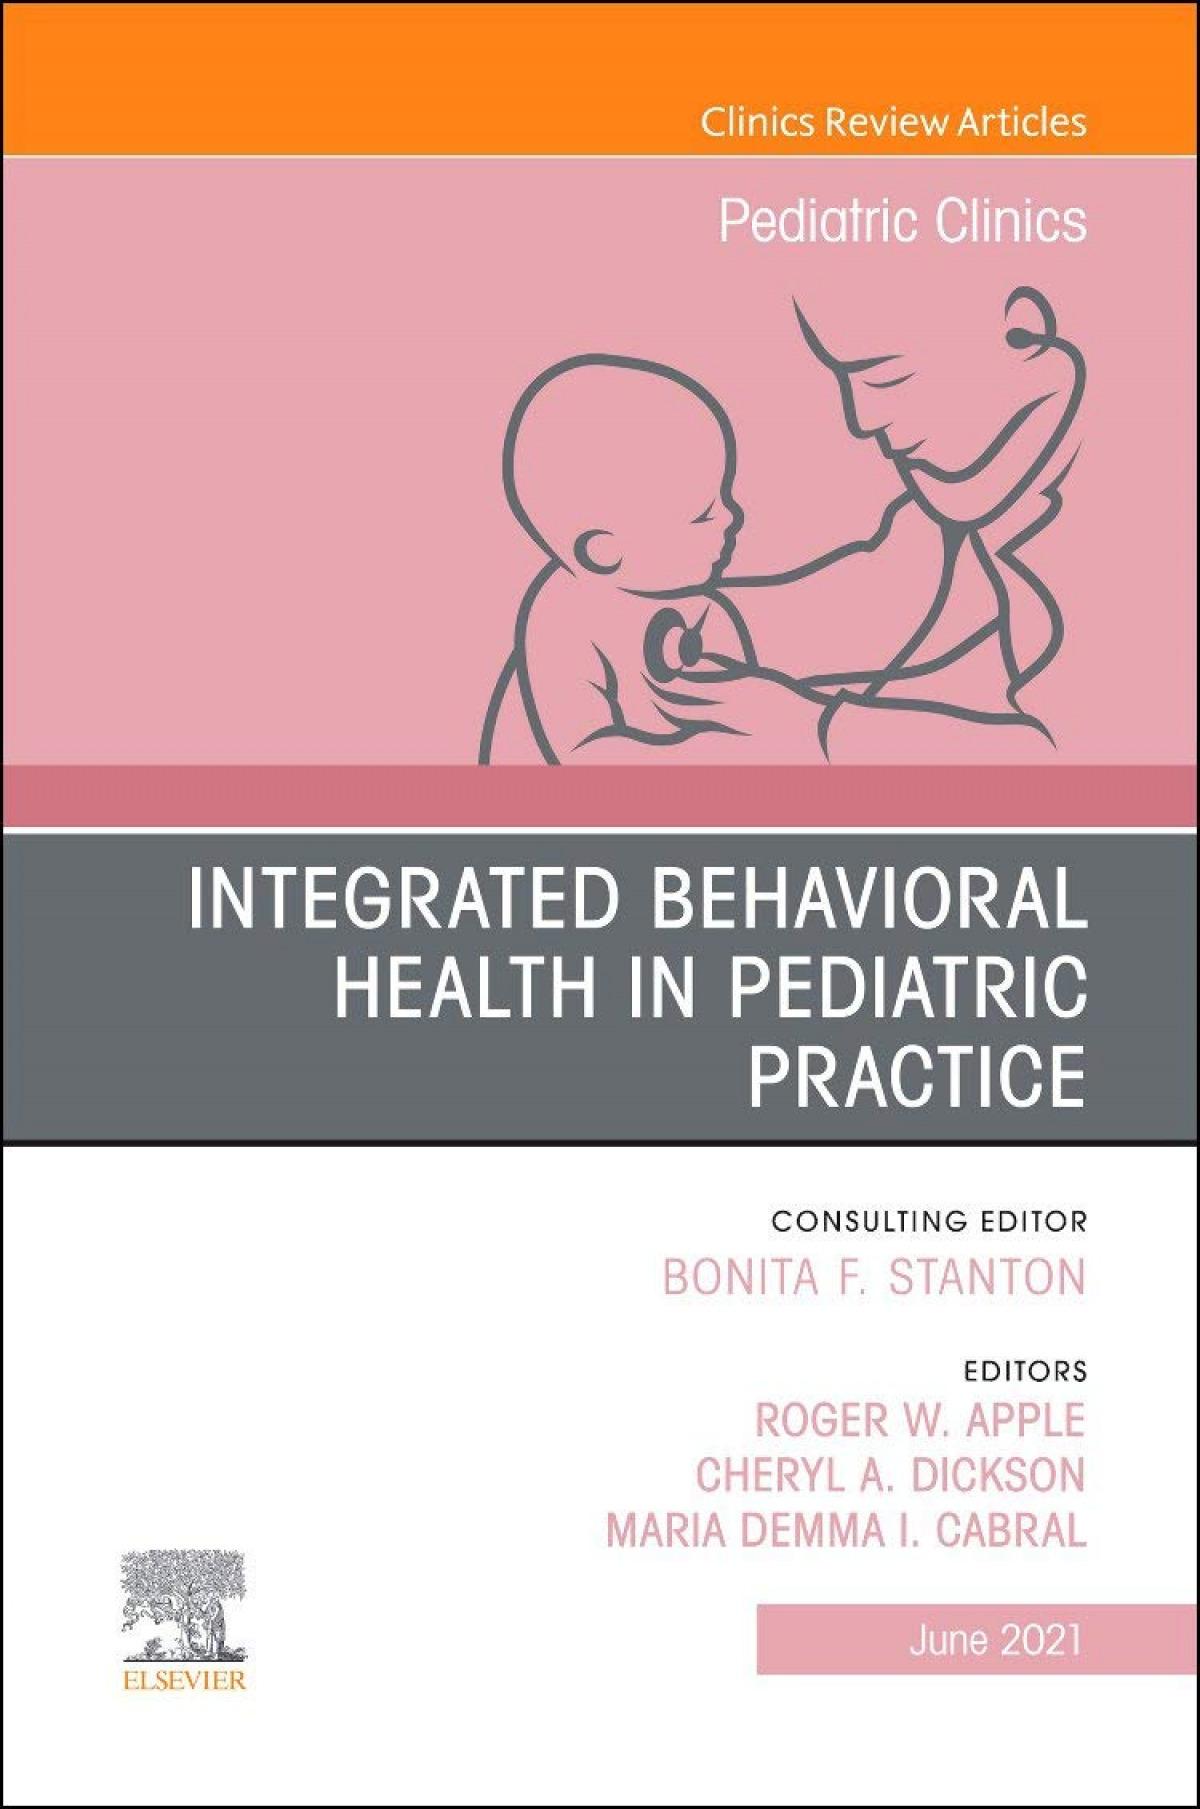 Integrated behavioral health pediatric practice